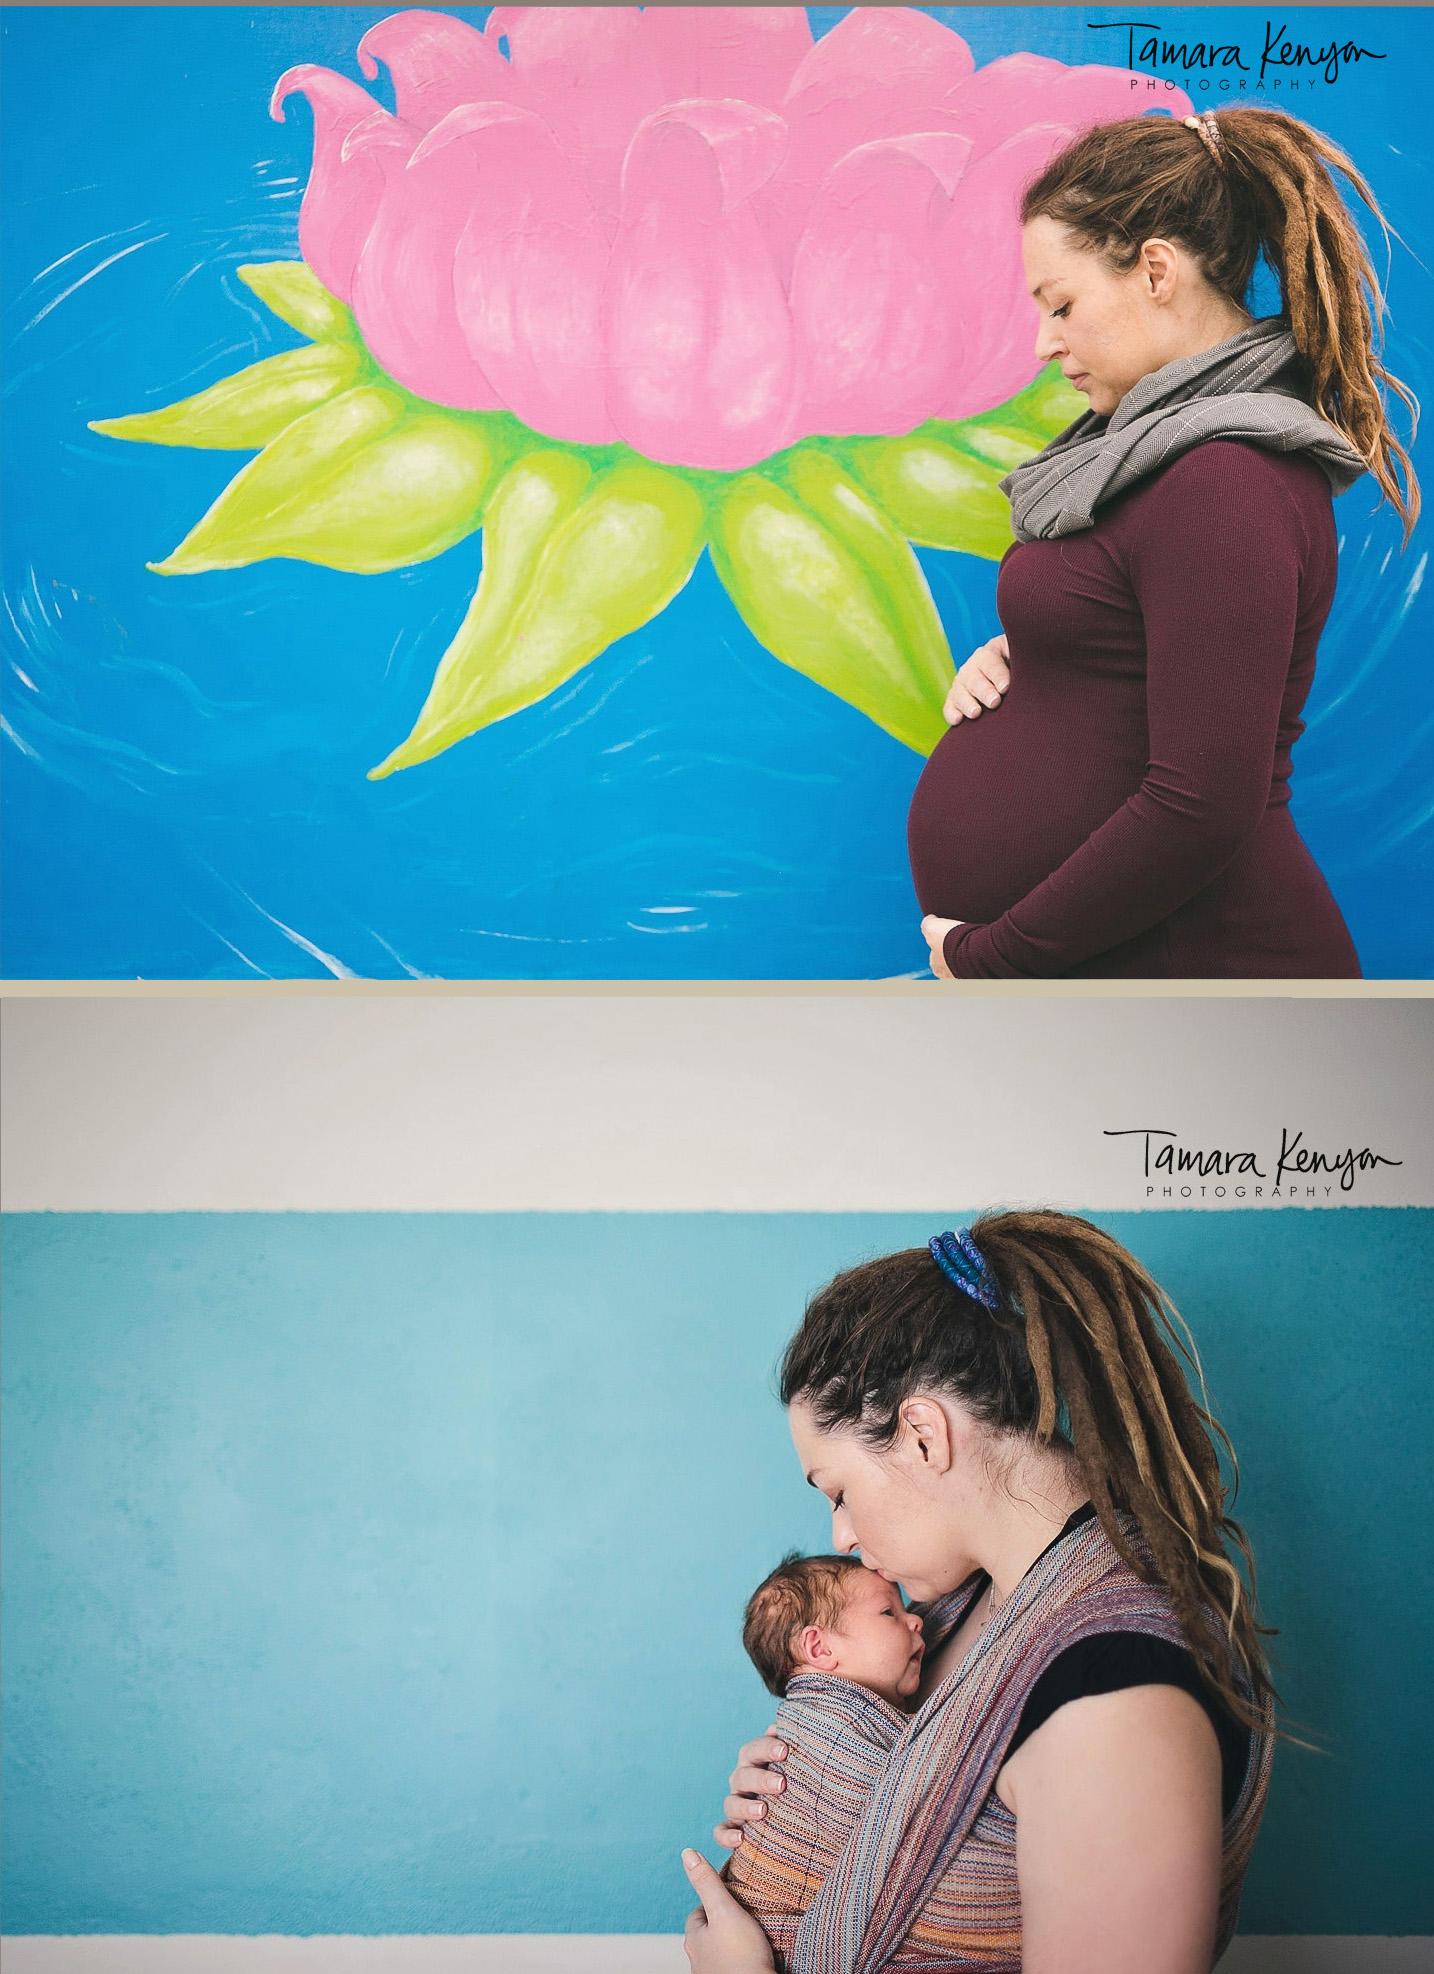 newborn photographer in boise tamara kenyon